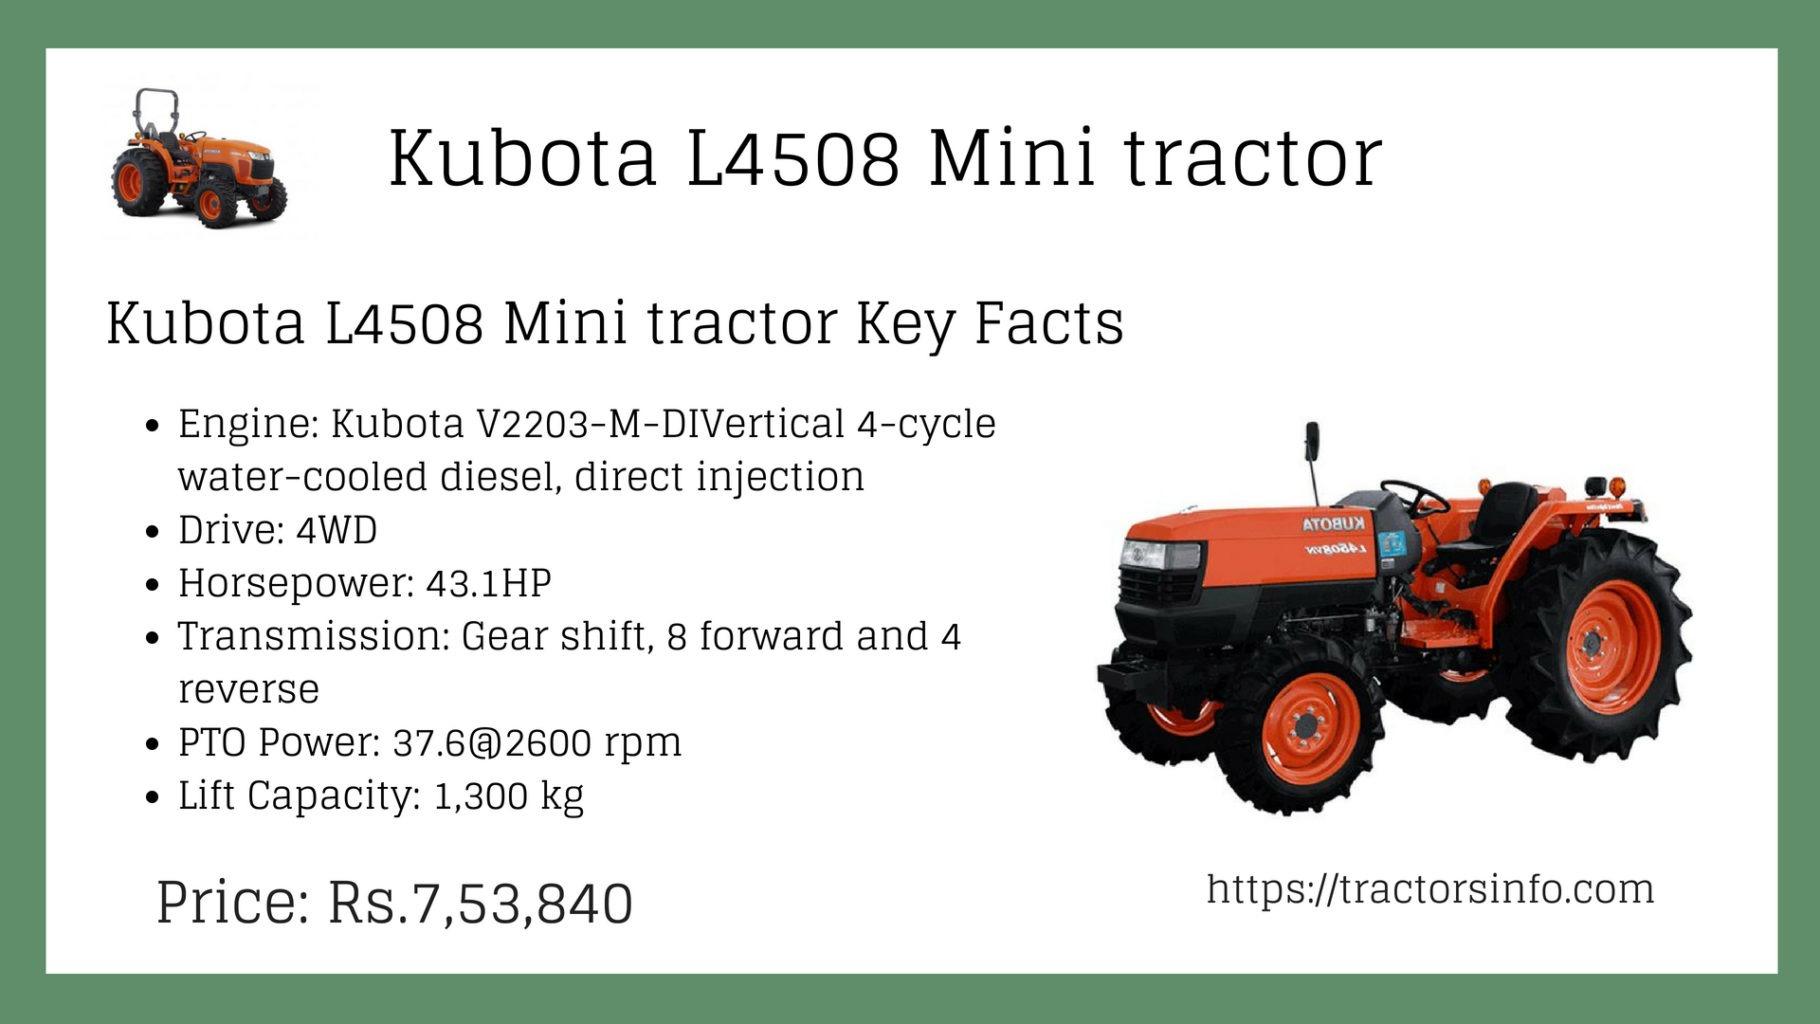 Kubota L4508 mini tractor